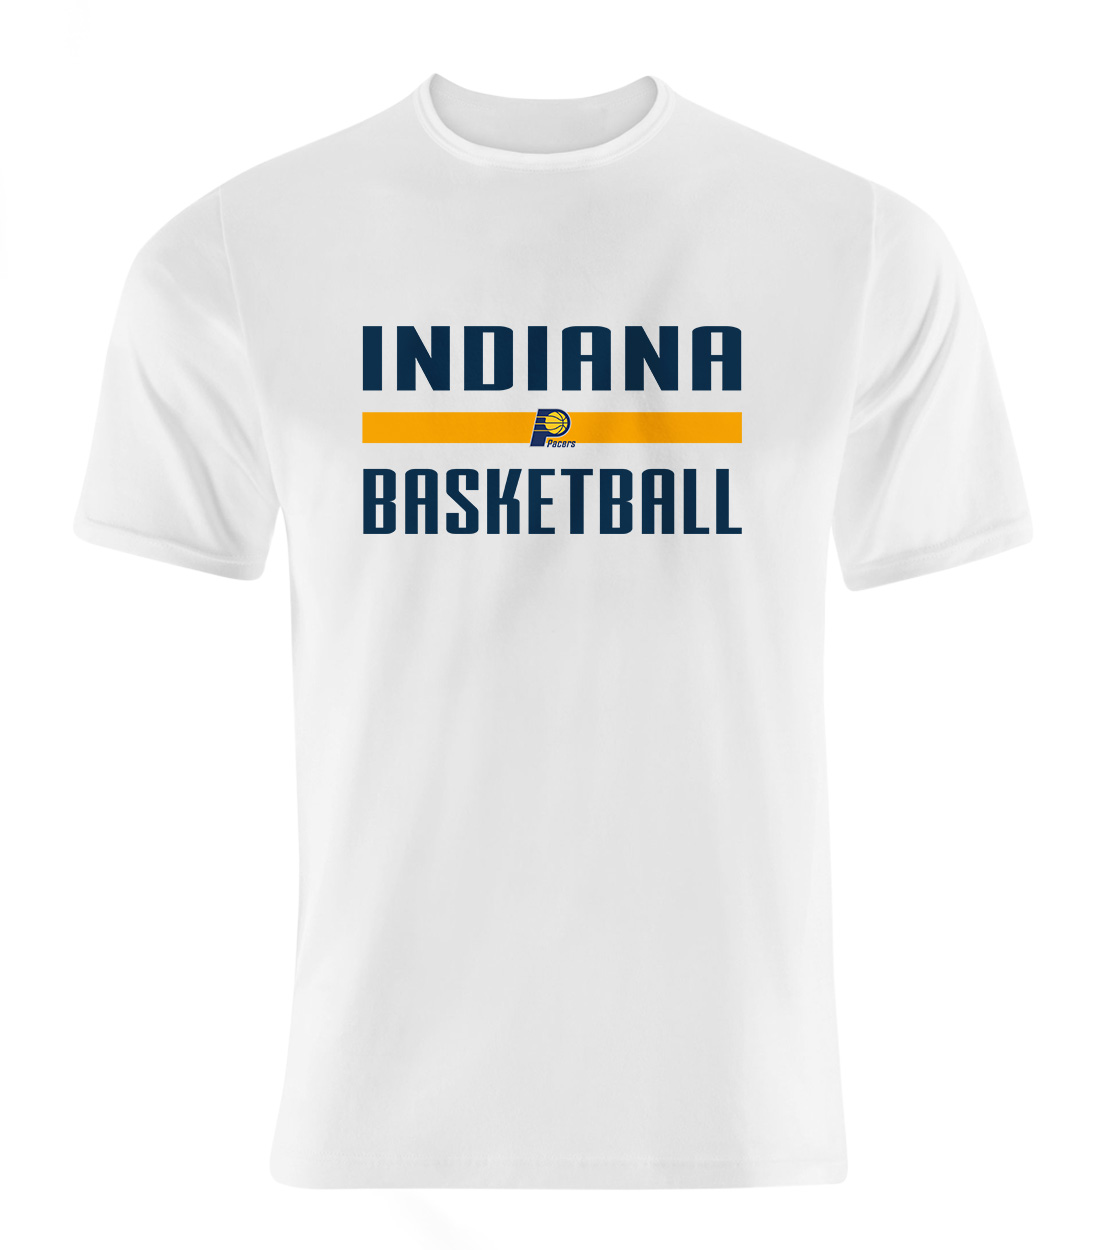 Indiana Basketball Tshirt (TSH-wht-NP-indiana-bsktbll-516)